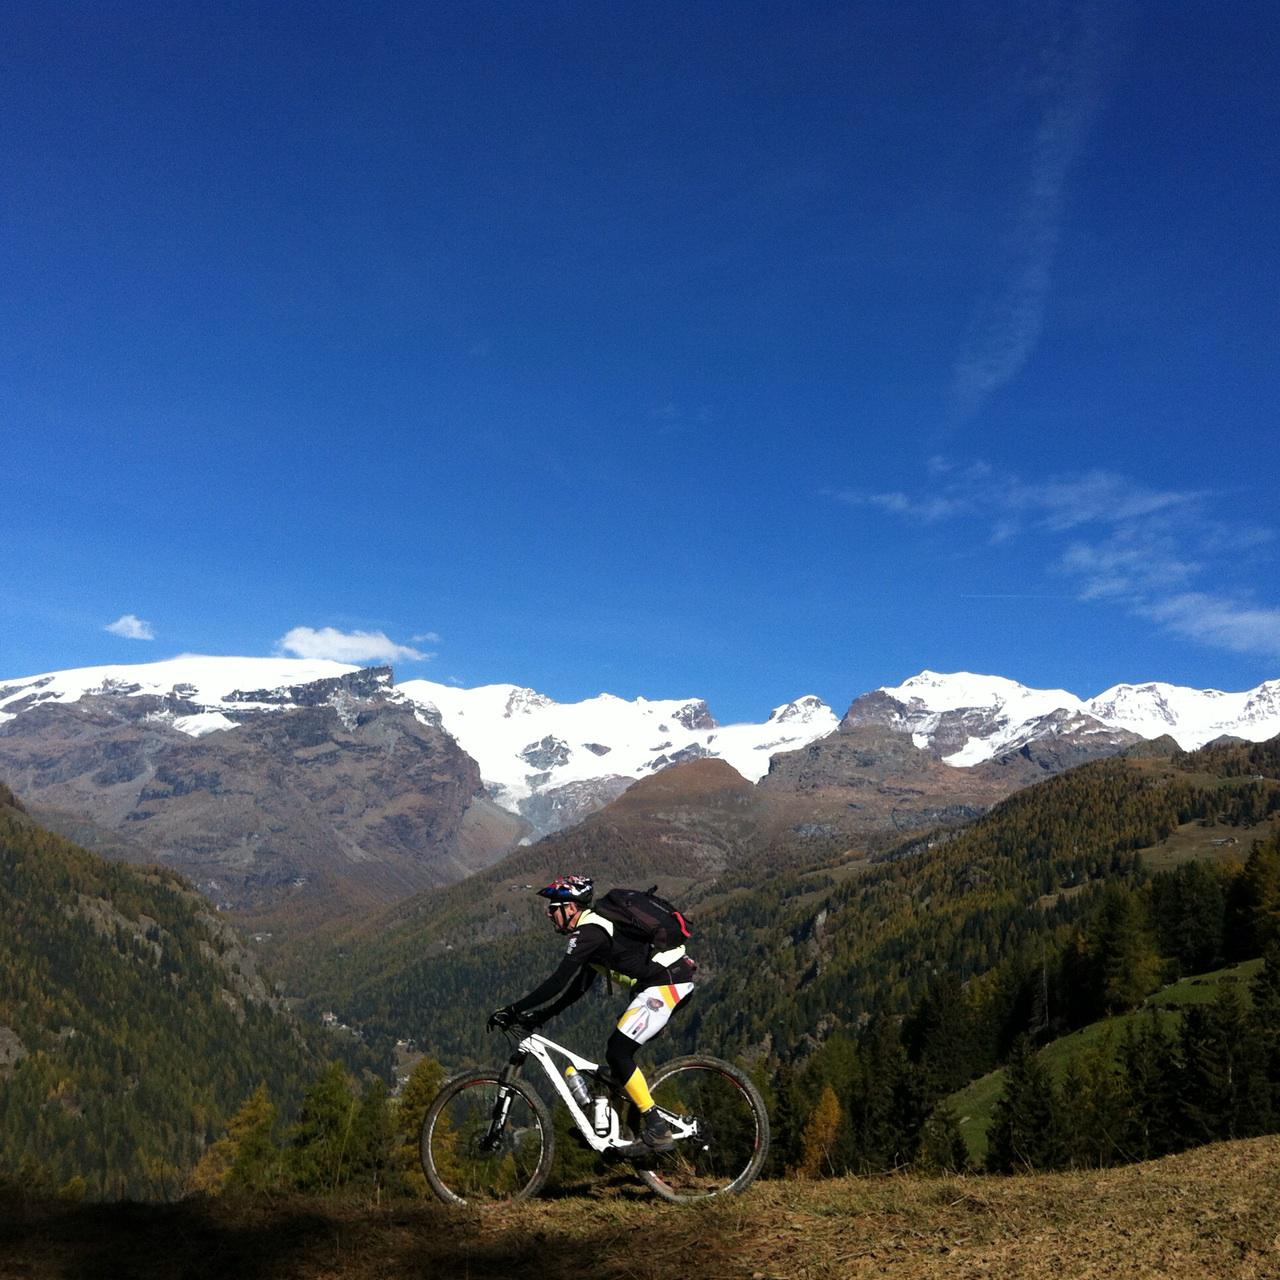 Mascognaz, Saint Jacques, Ru, Courtodda Arcesaz, Balconata alta Vall d'Ayas 2014-10-28